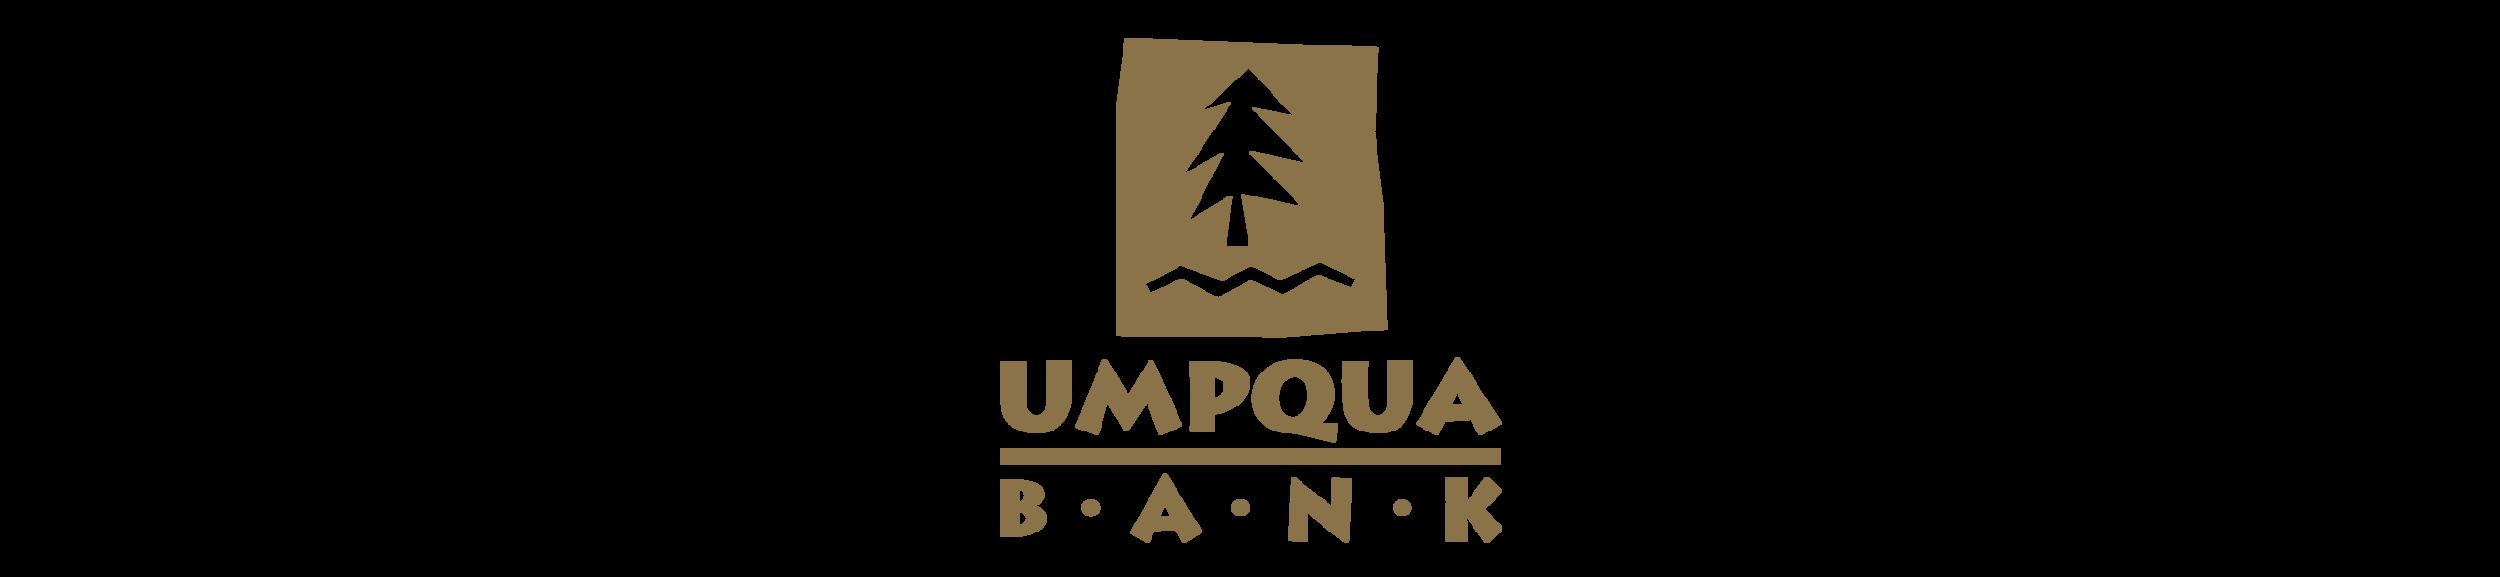 Umpqua_Logo_Gold.png